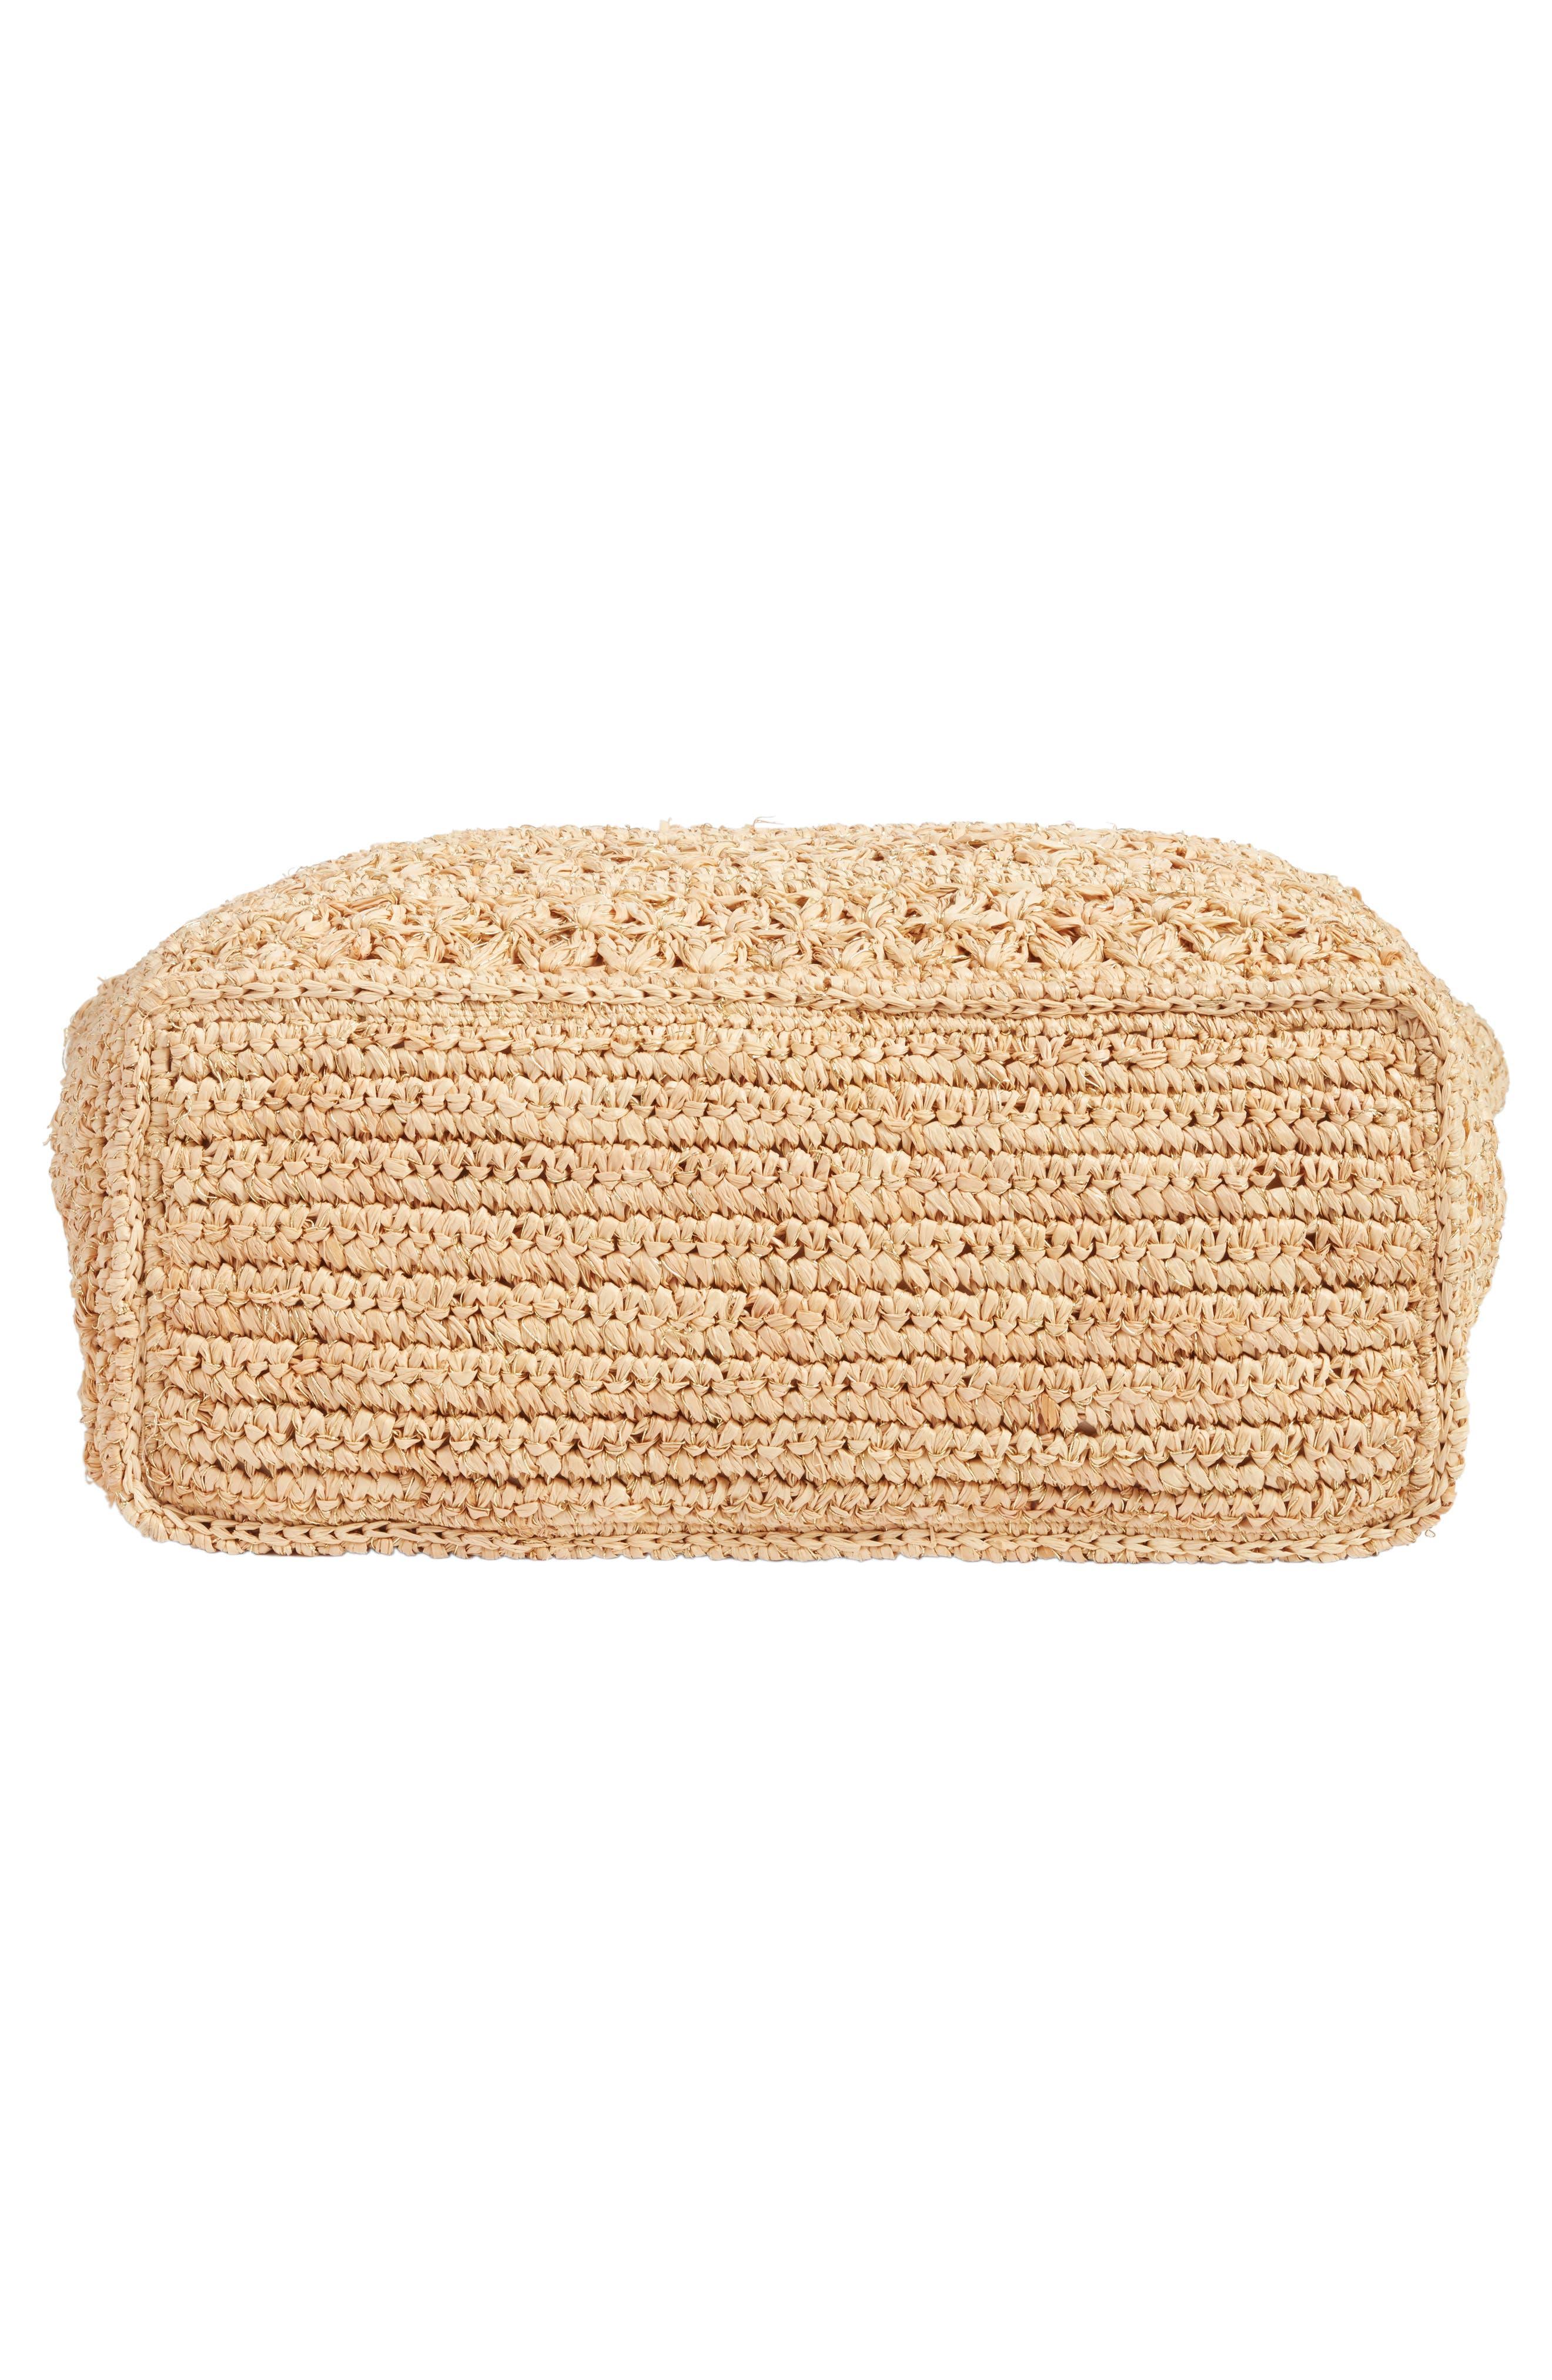 Packable Raffia Crochet Tote,                             Alternate thumbnail 6, color,                             Natural/ Gold